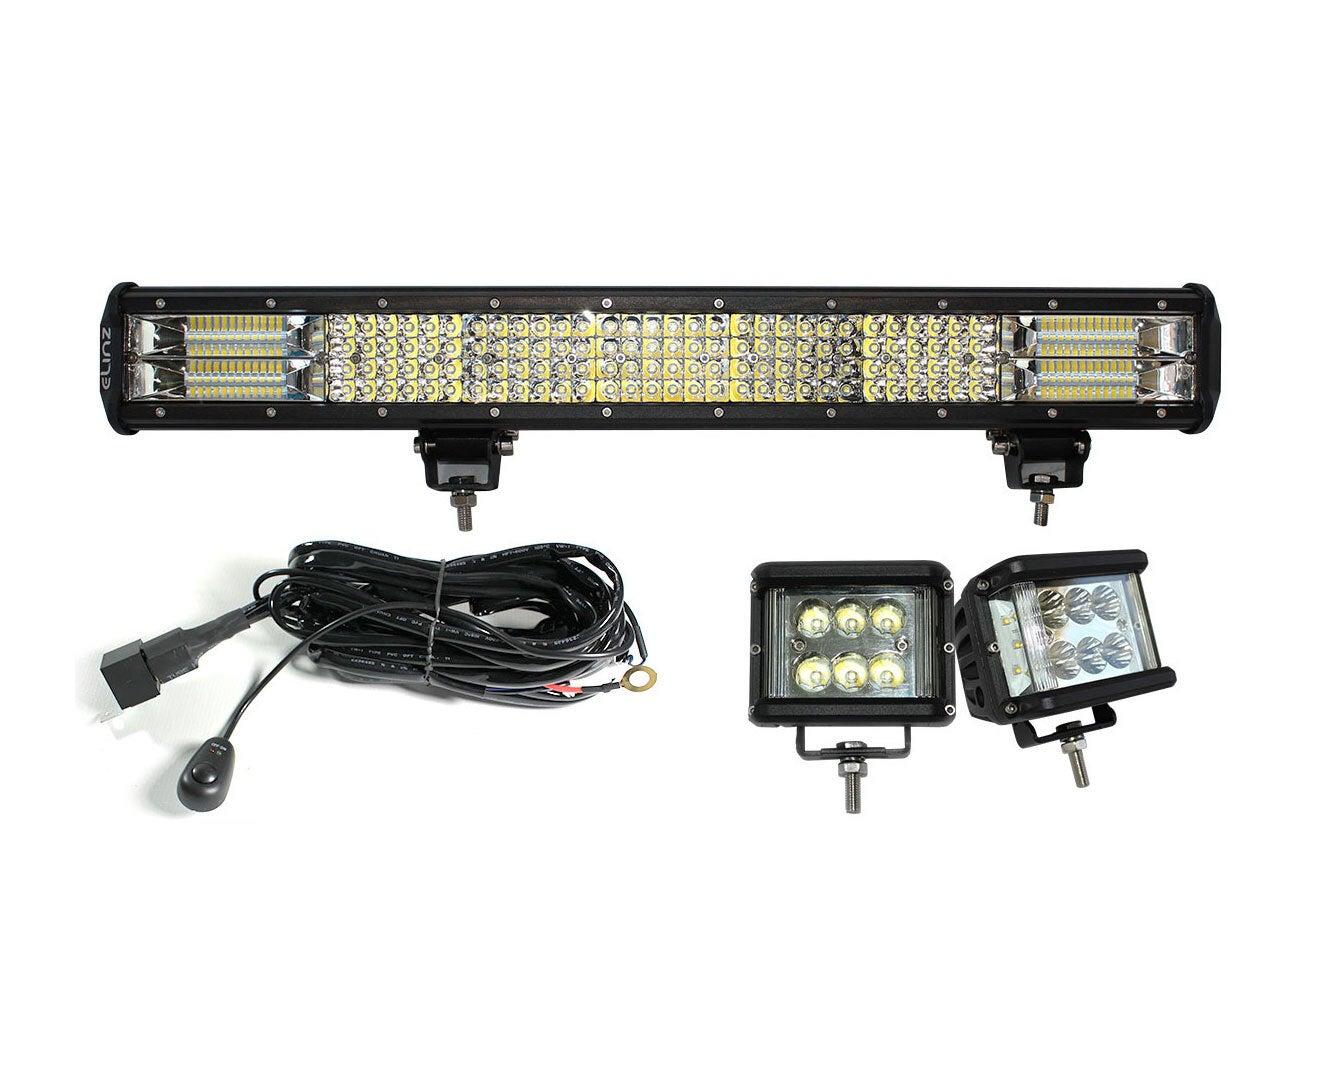 "Elinz 23"" LED Light Bar Philips 4 Rows Bundle 2x 60W Driving WorkLight Flood Spot Beam"